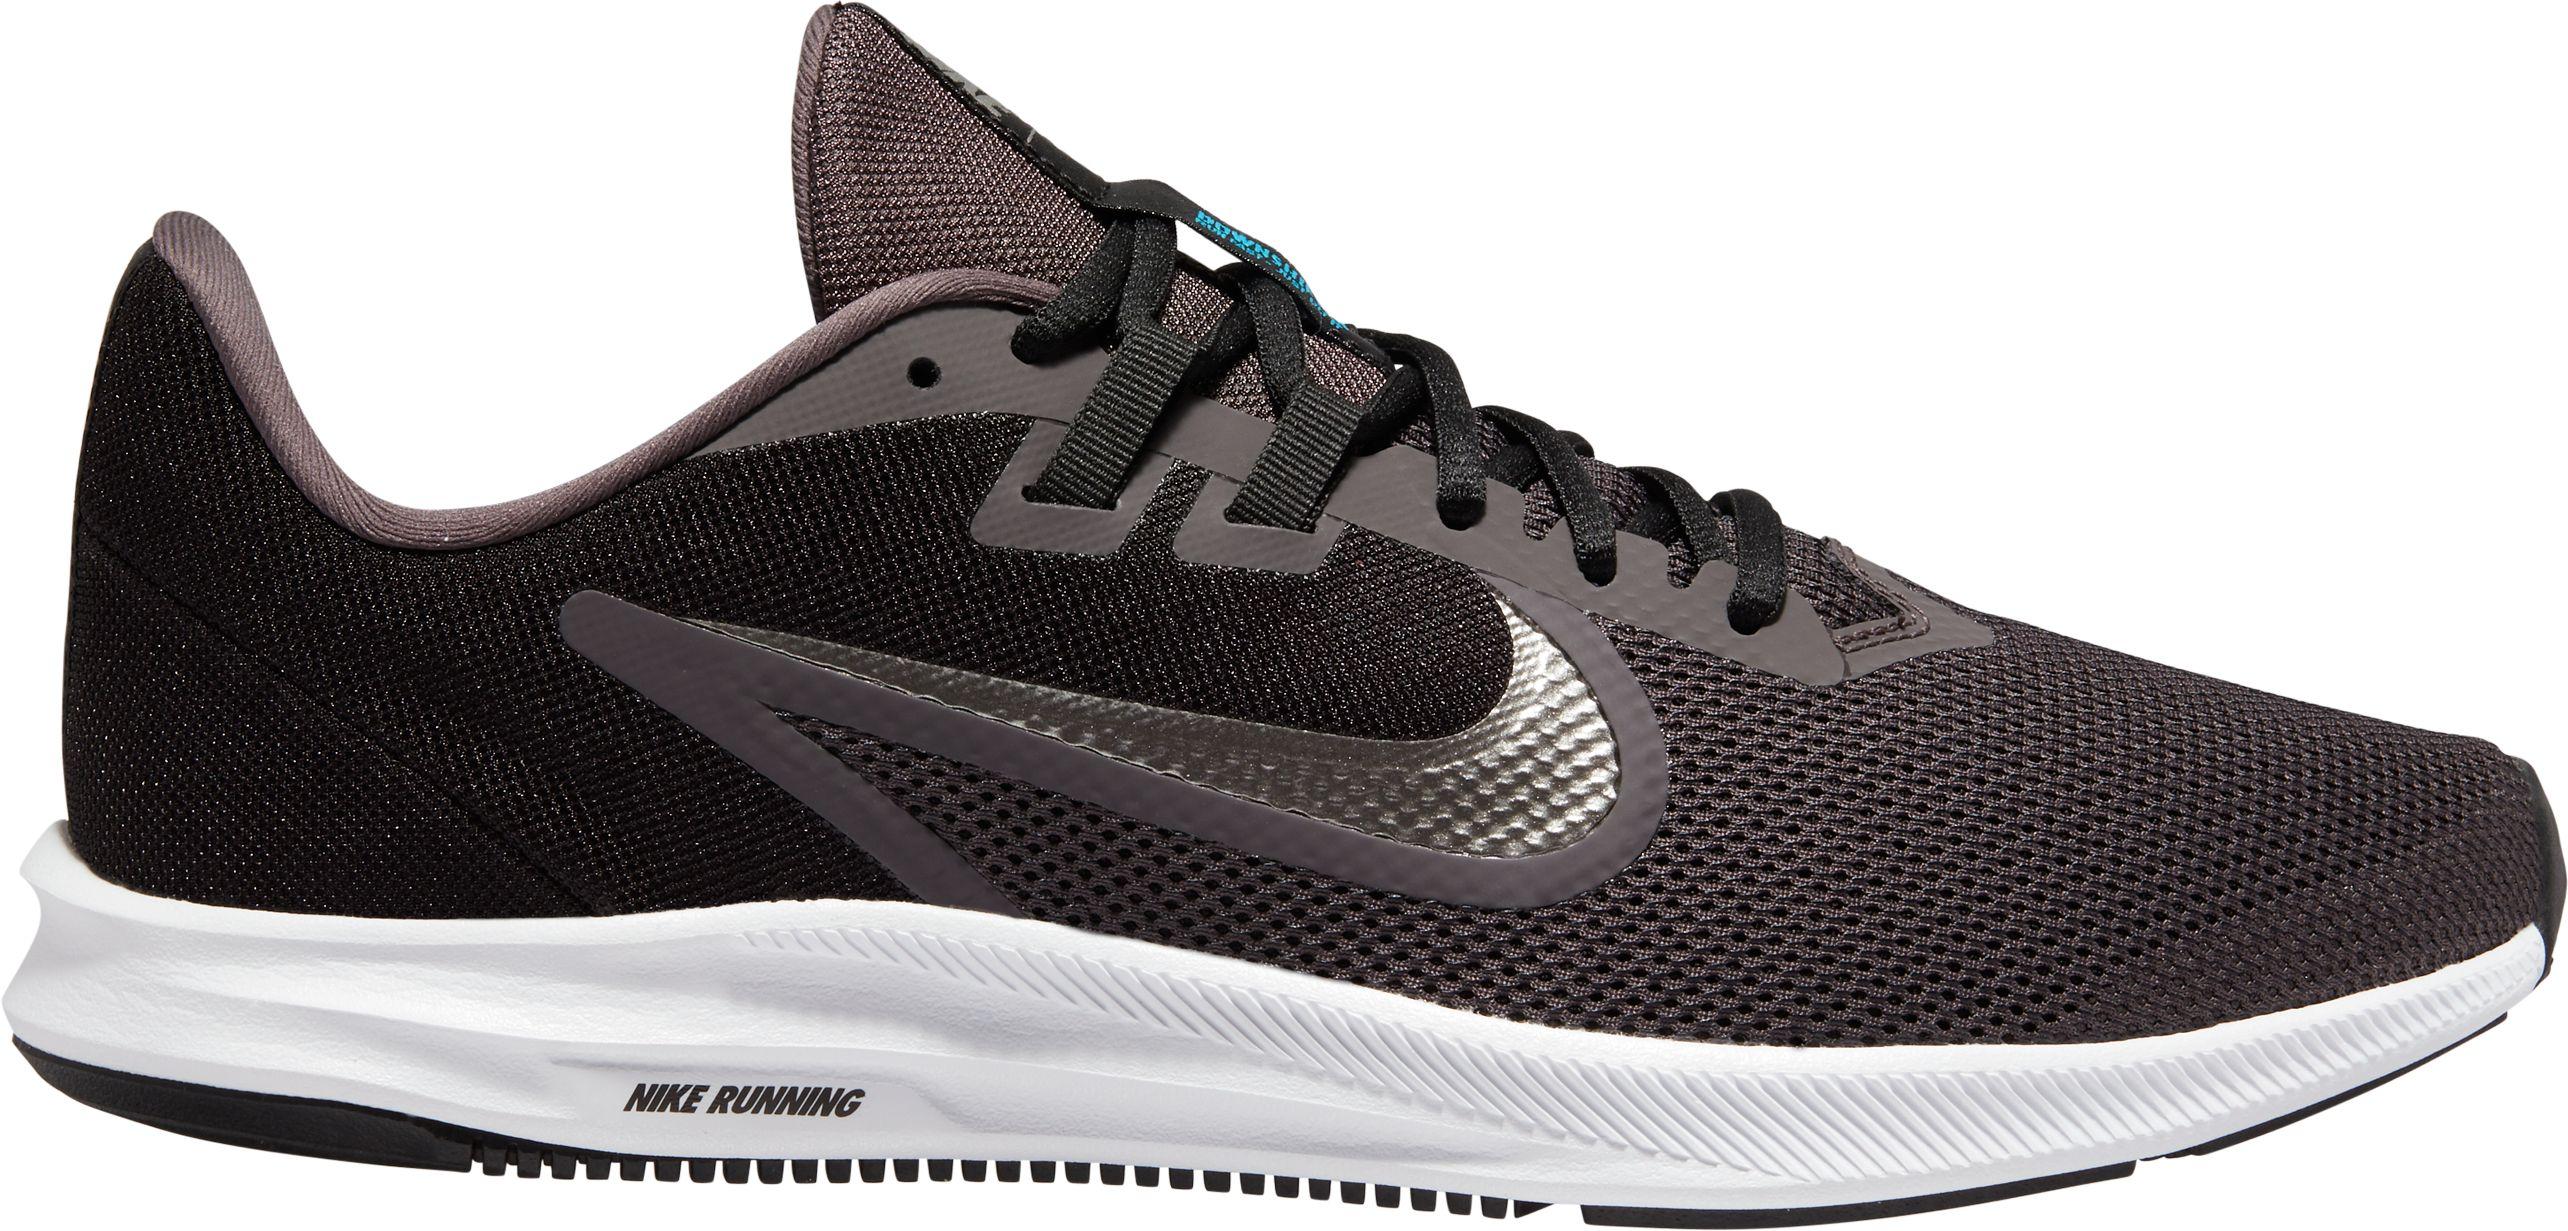 Nike Downshifter 9 29 Übergrößen9632 In bf6gvY7y